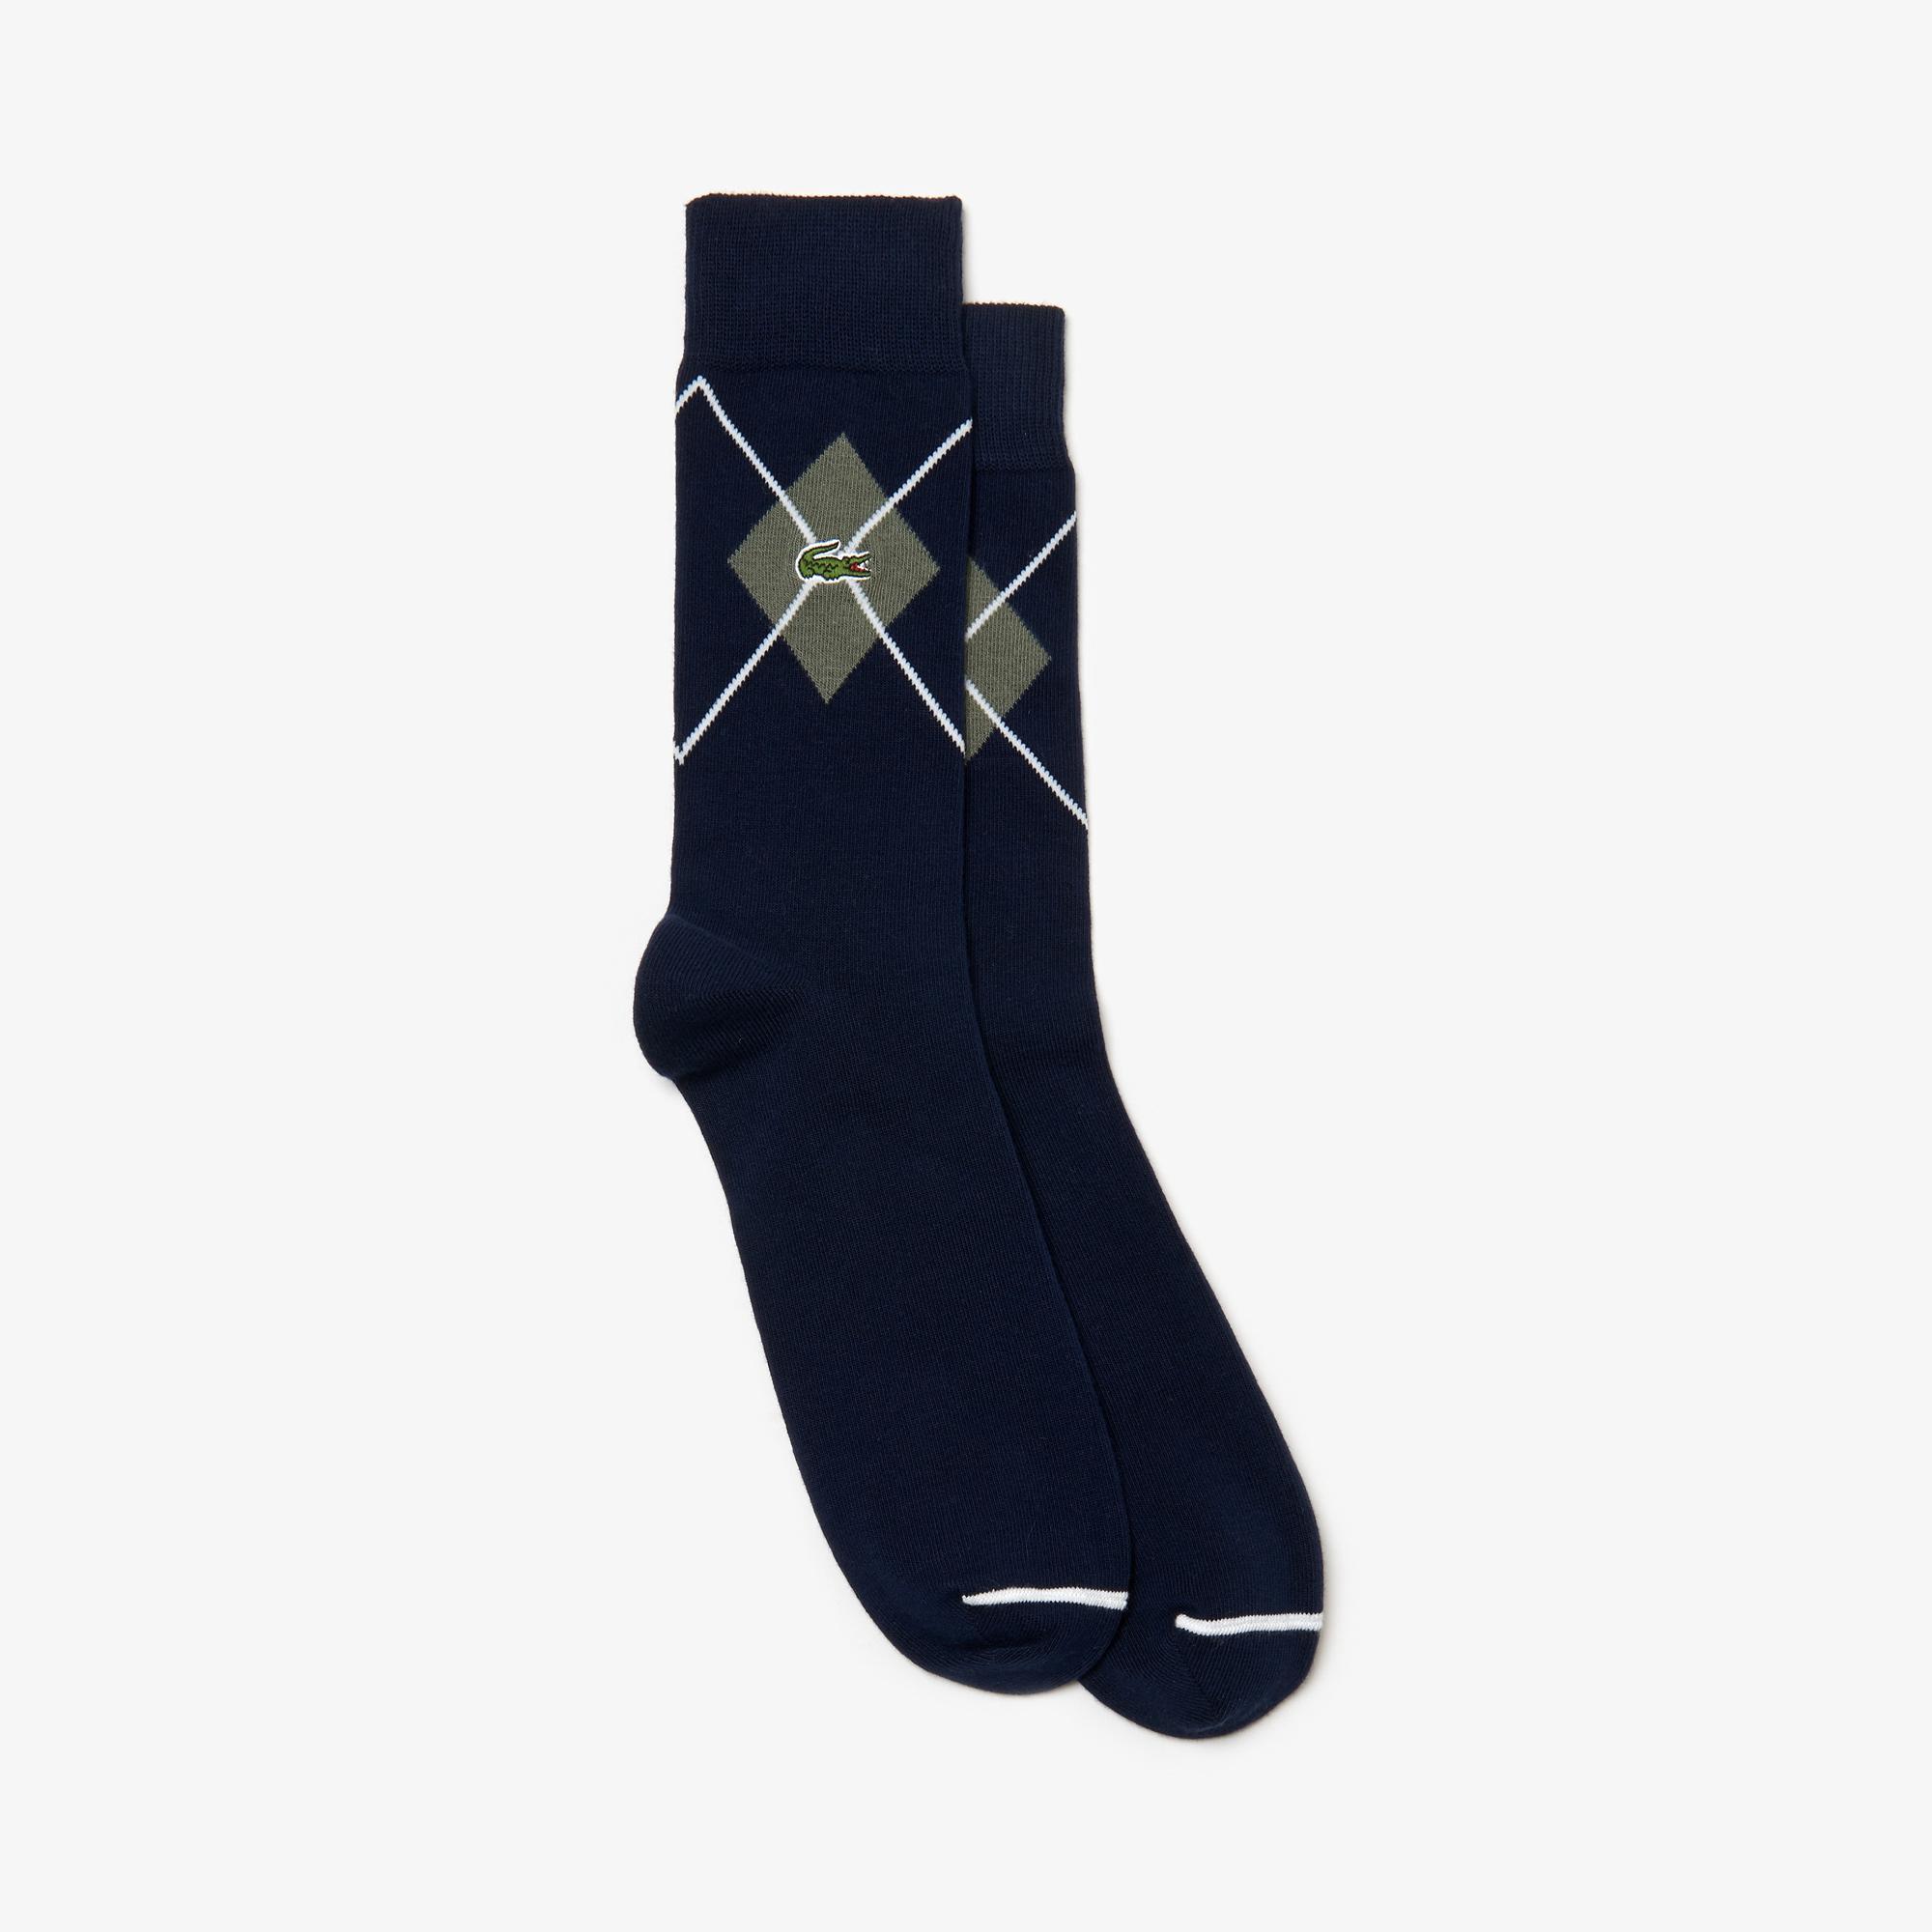 Lacoste Unisex Desenli Lacivert Çorap